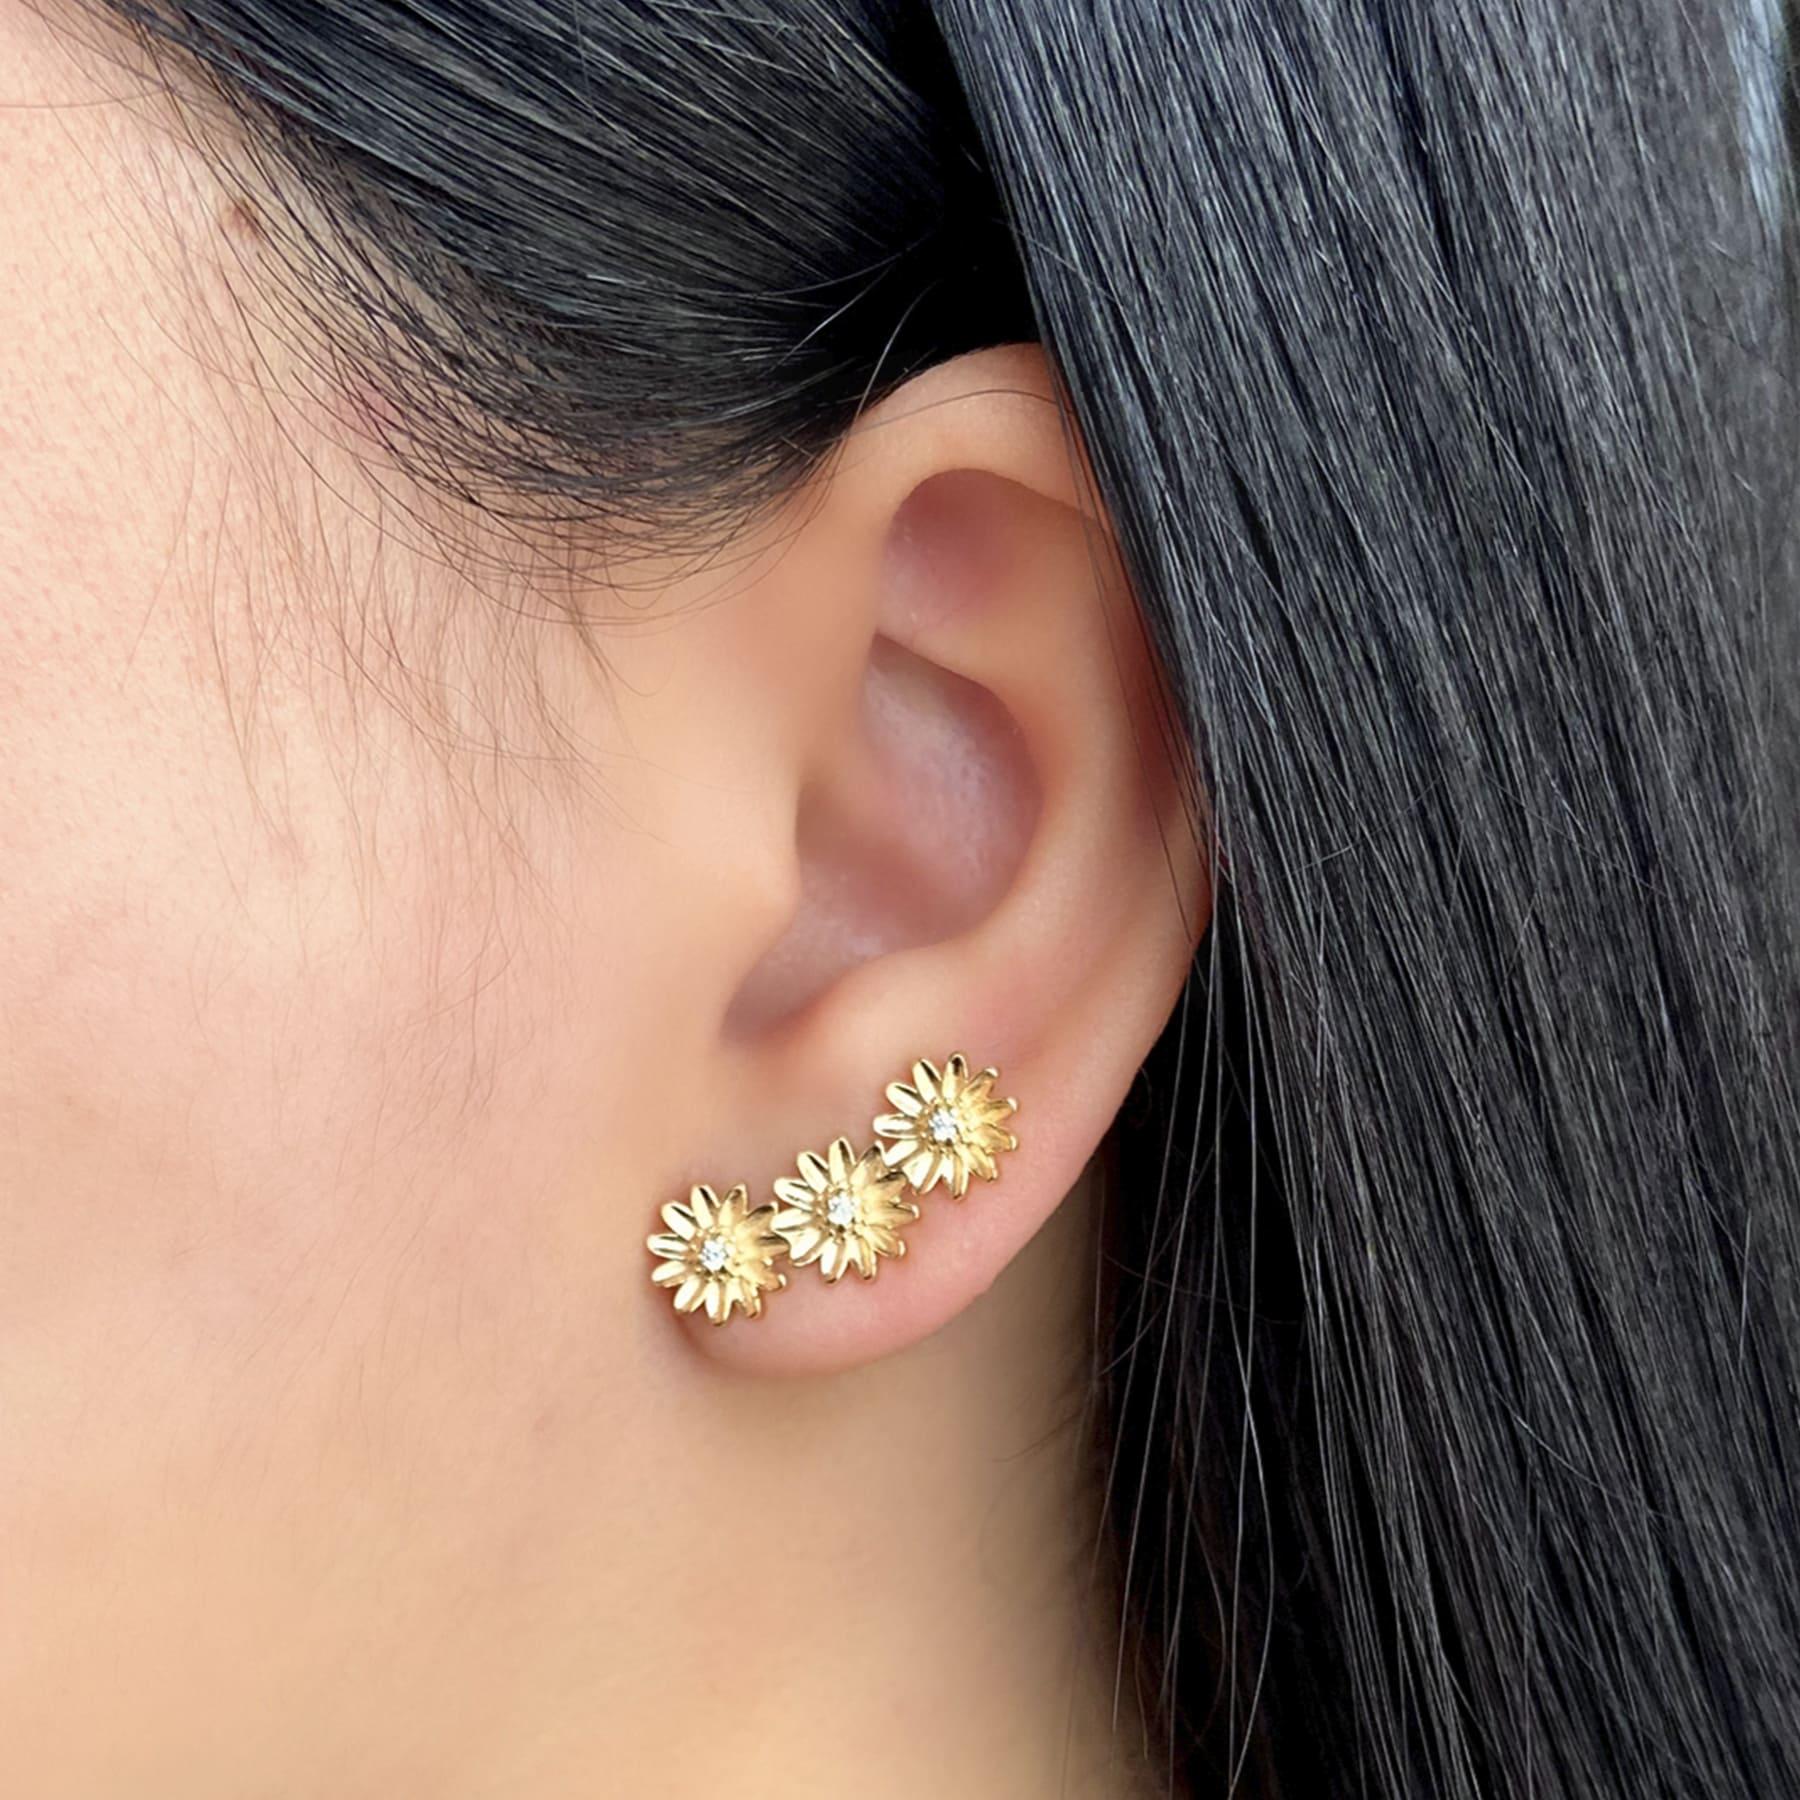 Brinco Ear Cuff Folheado Girassol - Natureza